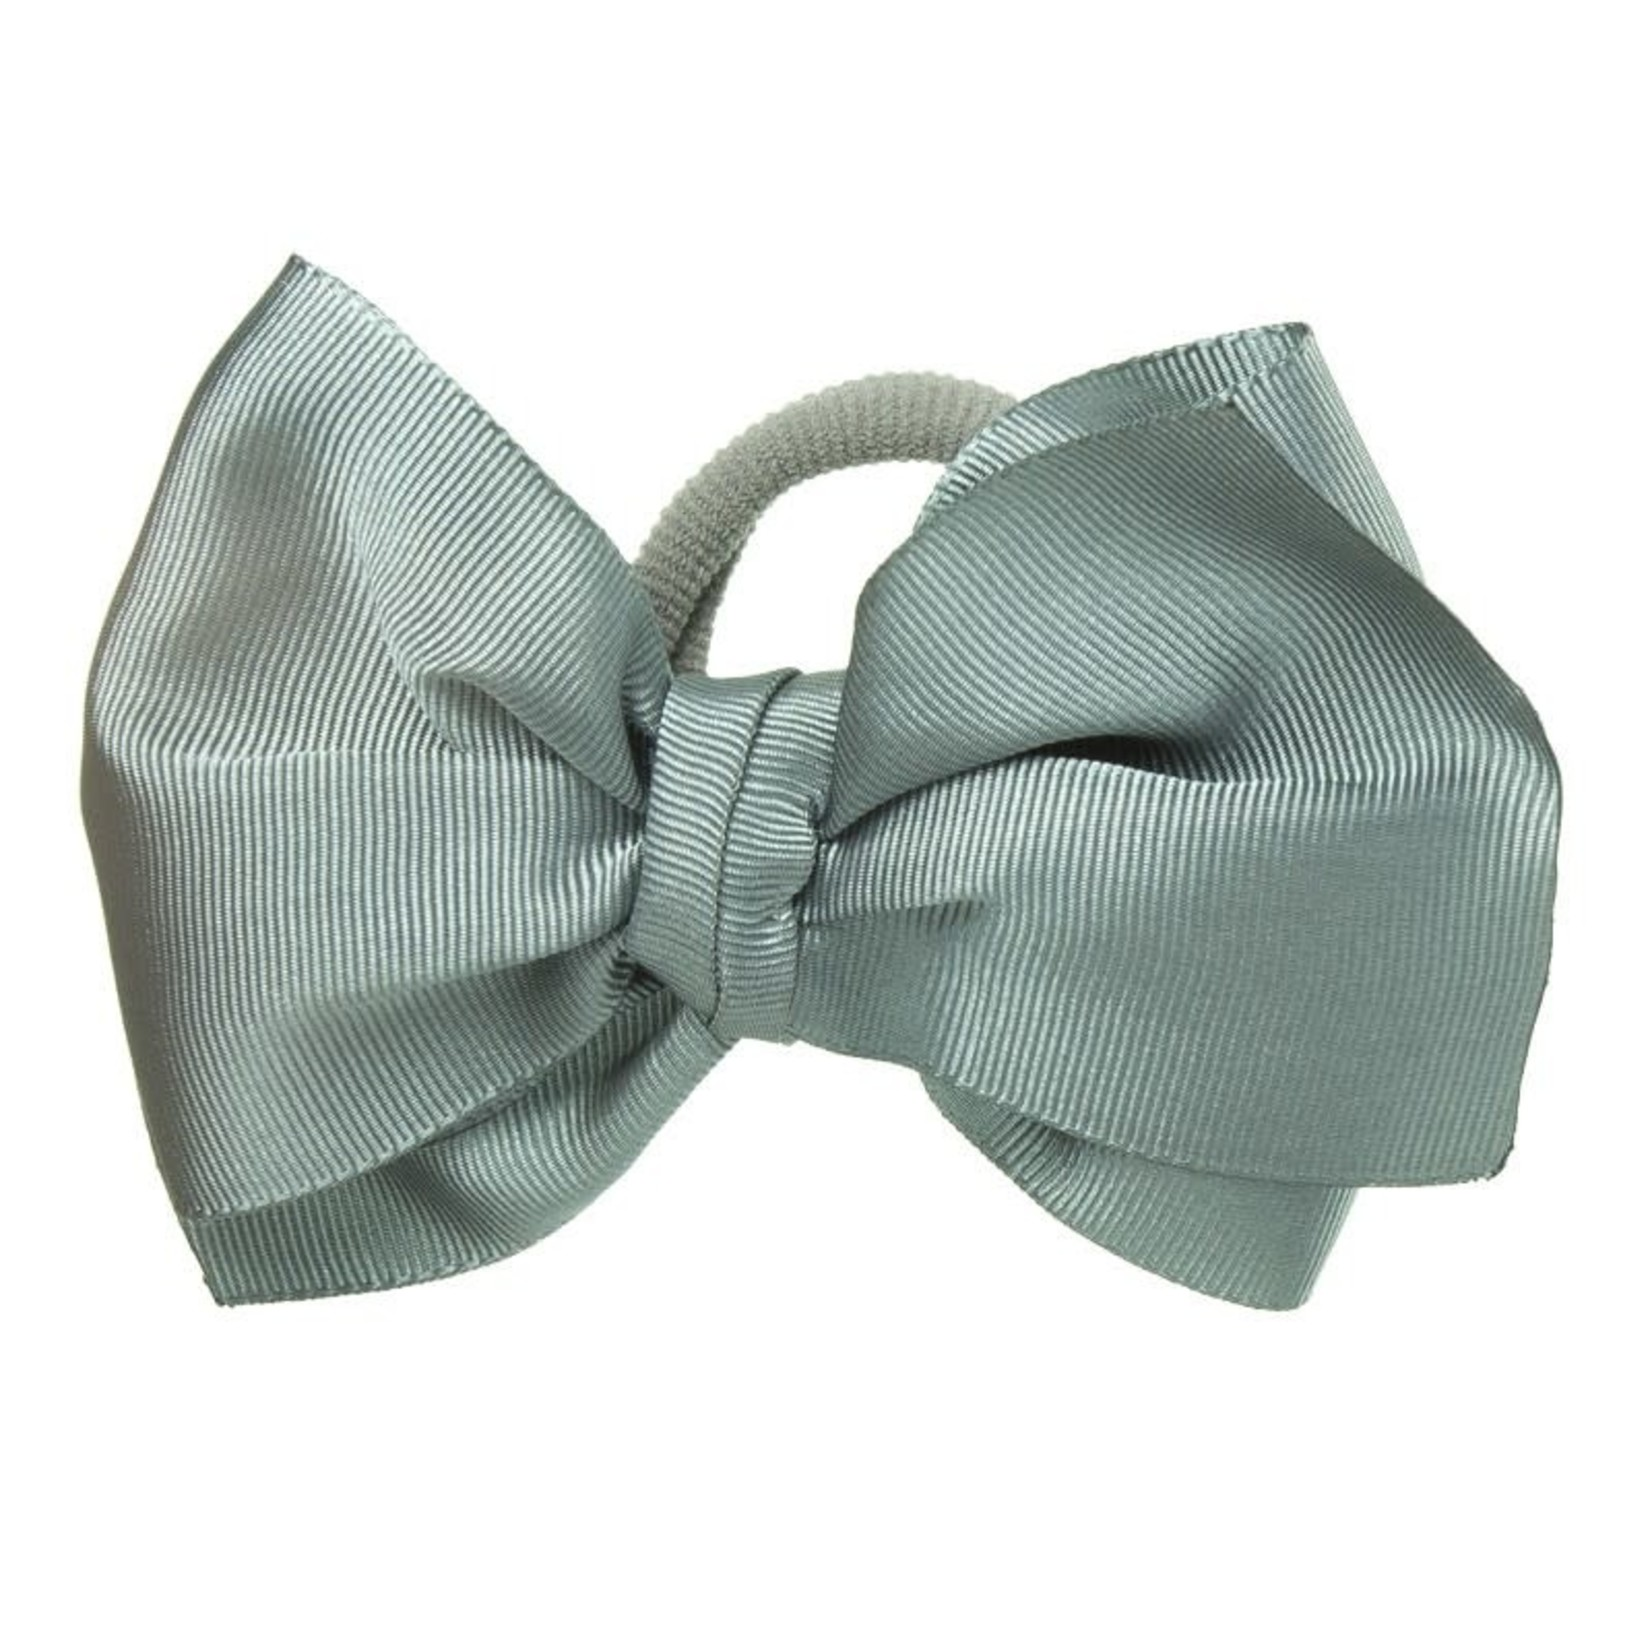 Siena Hair Bow - Gray